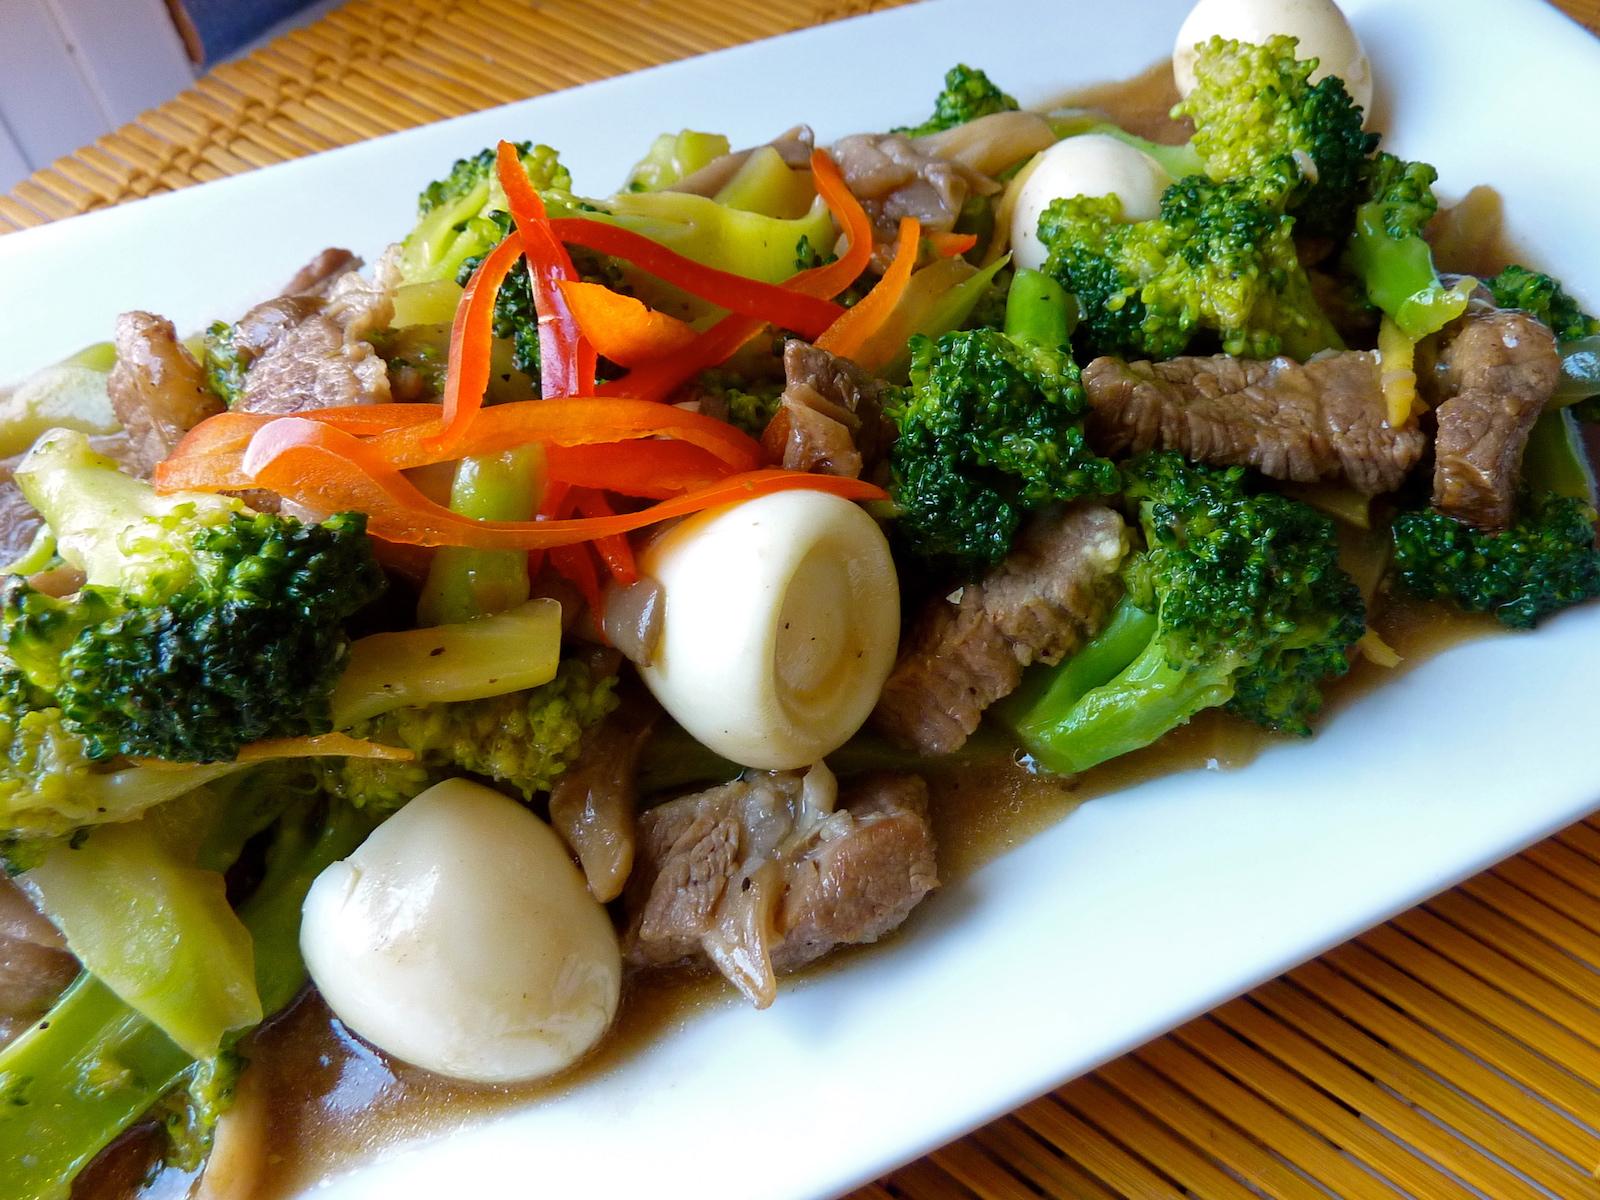 Beef mushroom broccoli